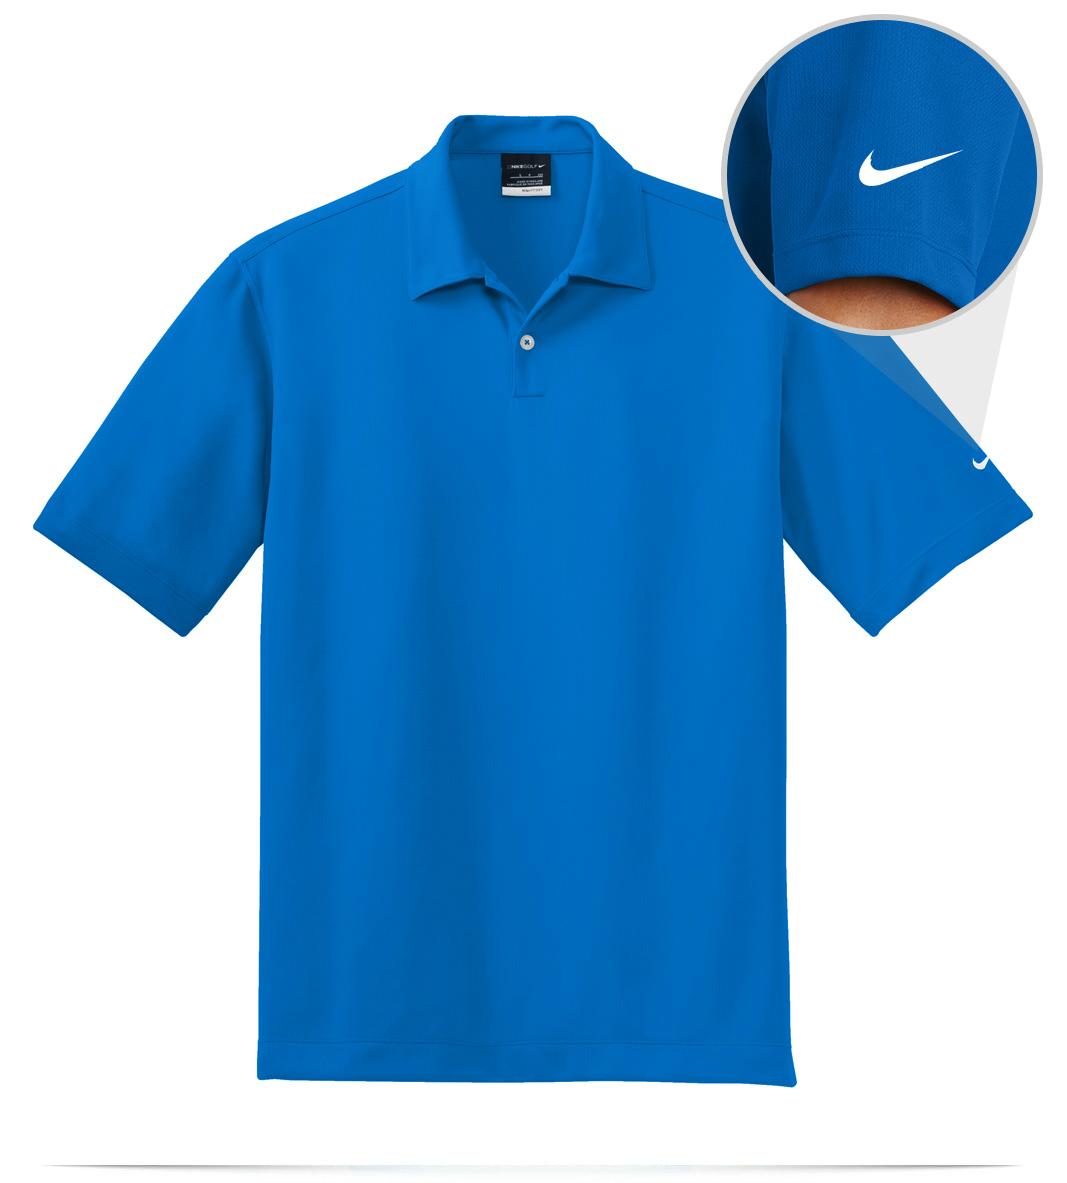 Design Embroidered Custom Nike Golf Shirt Online At Allstar Logo